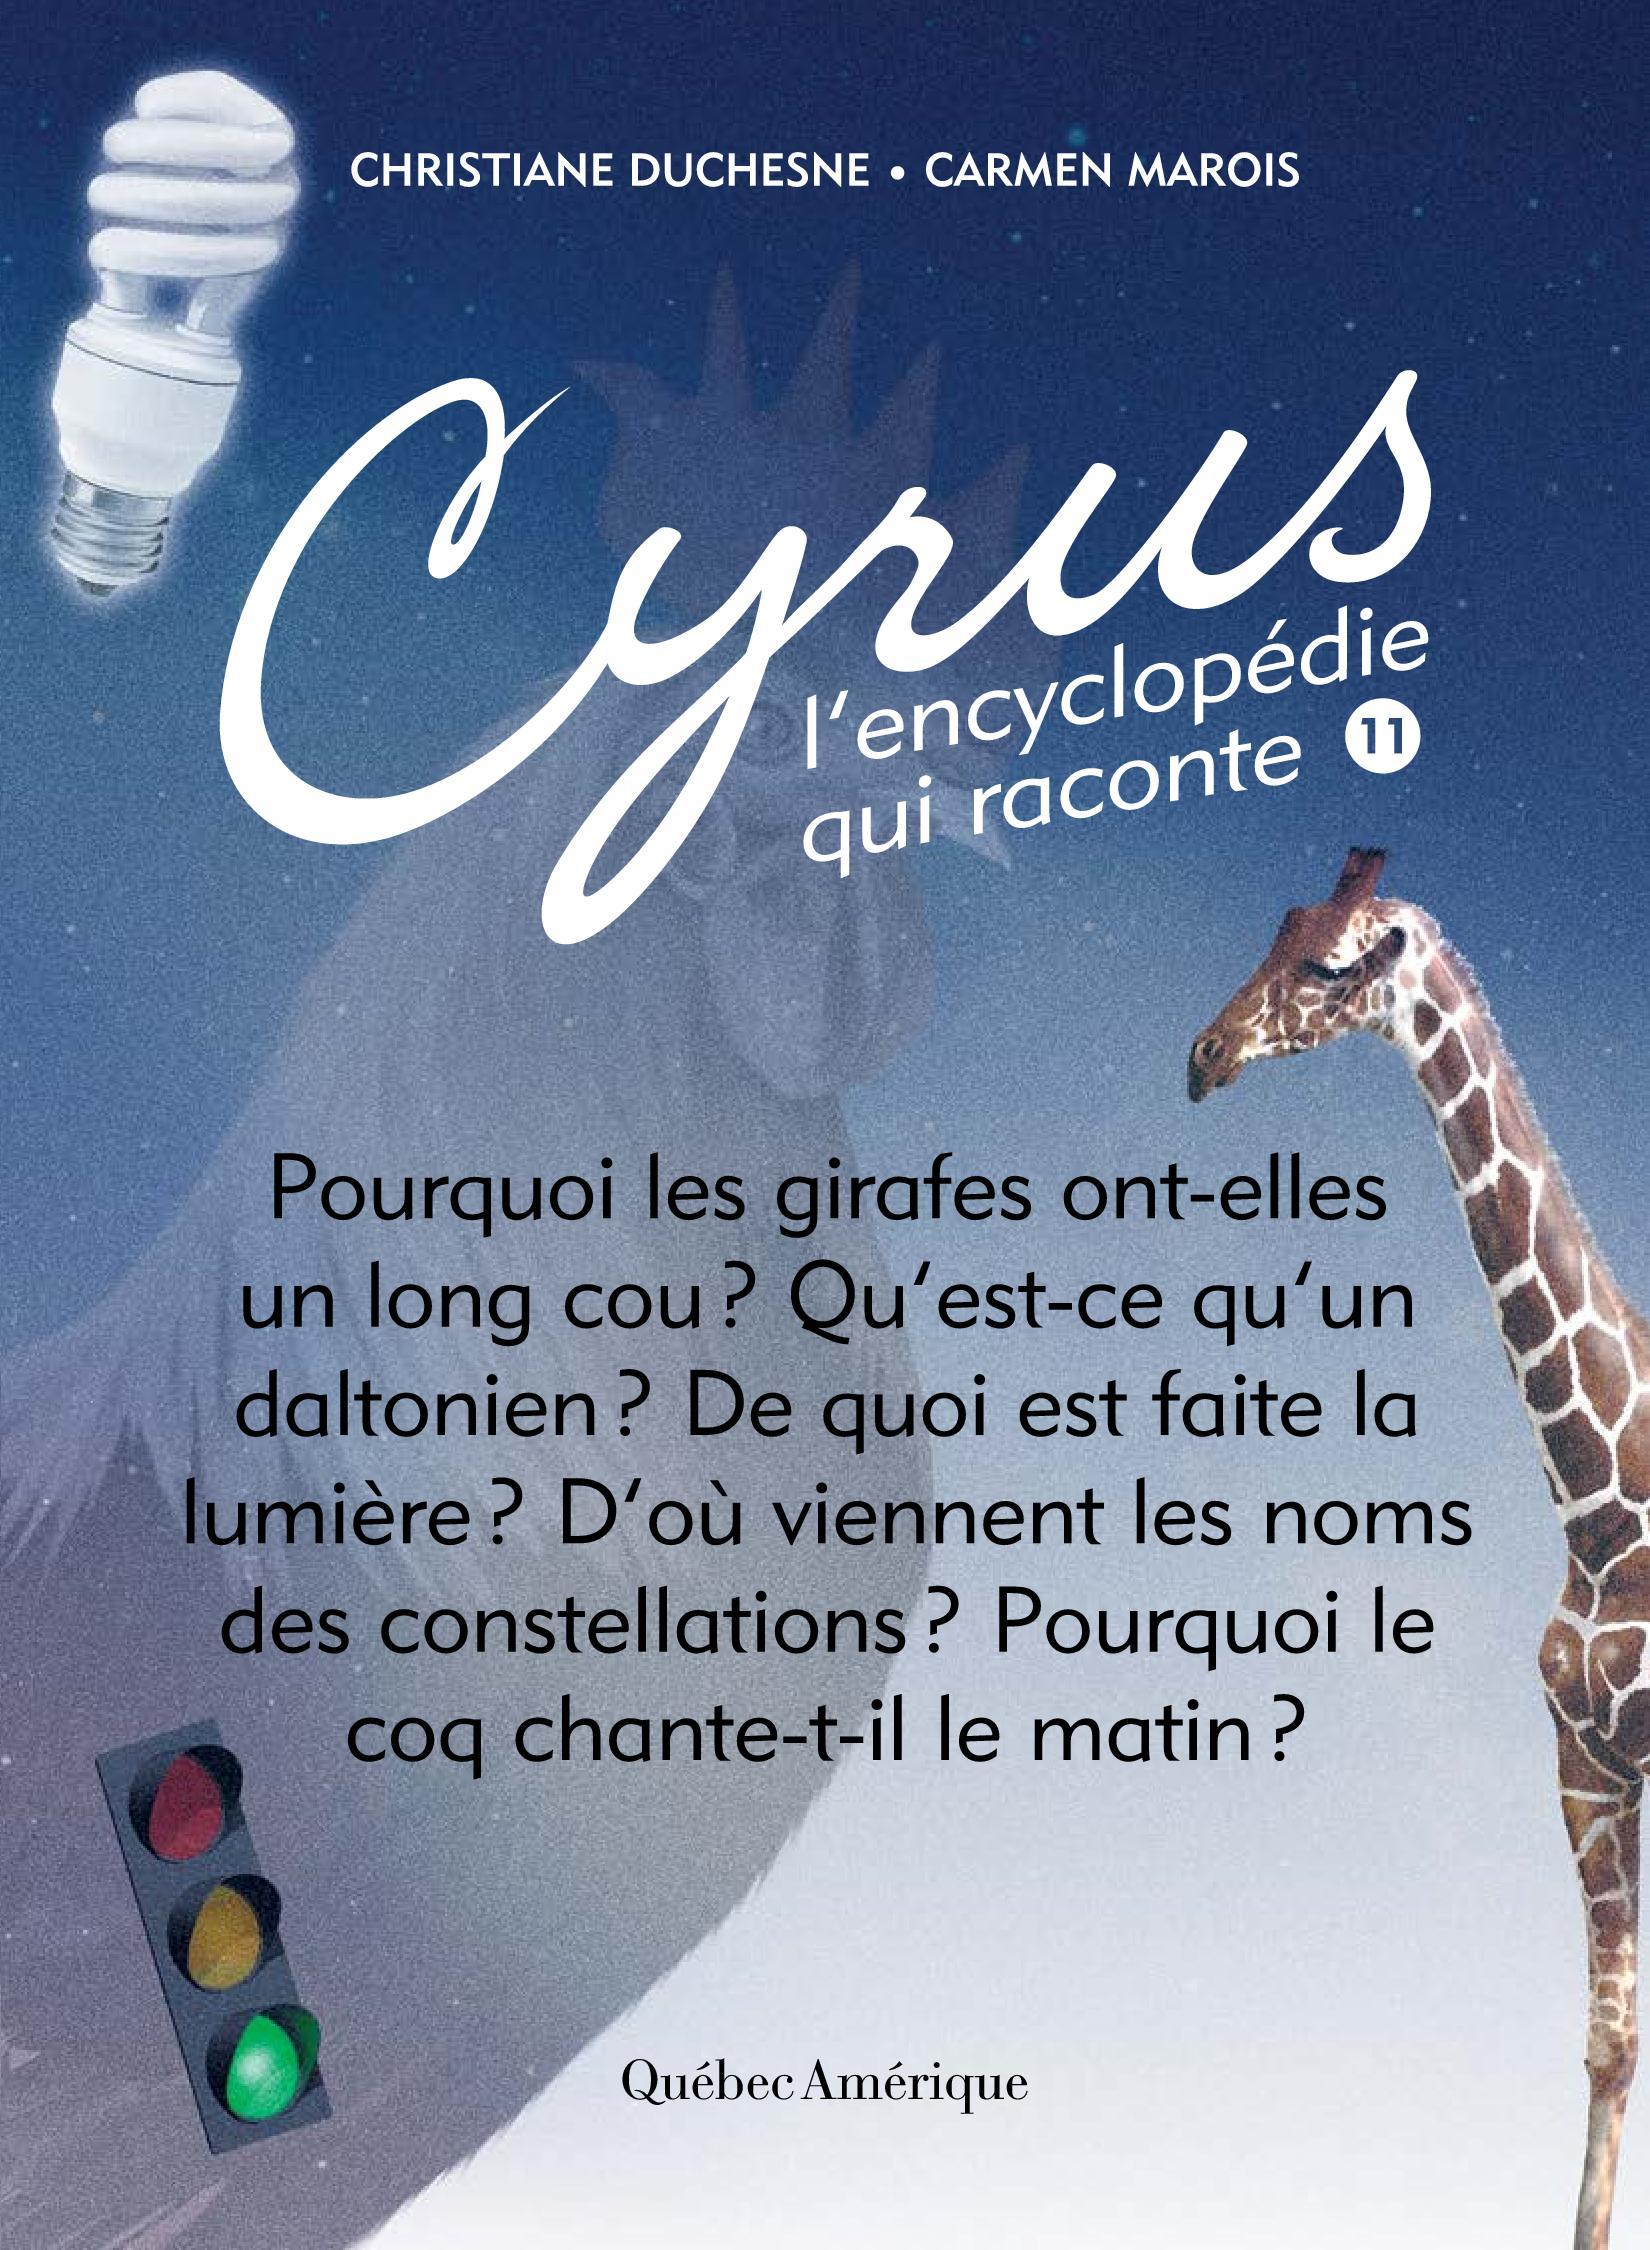 Cyrus 11